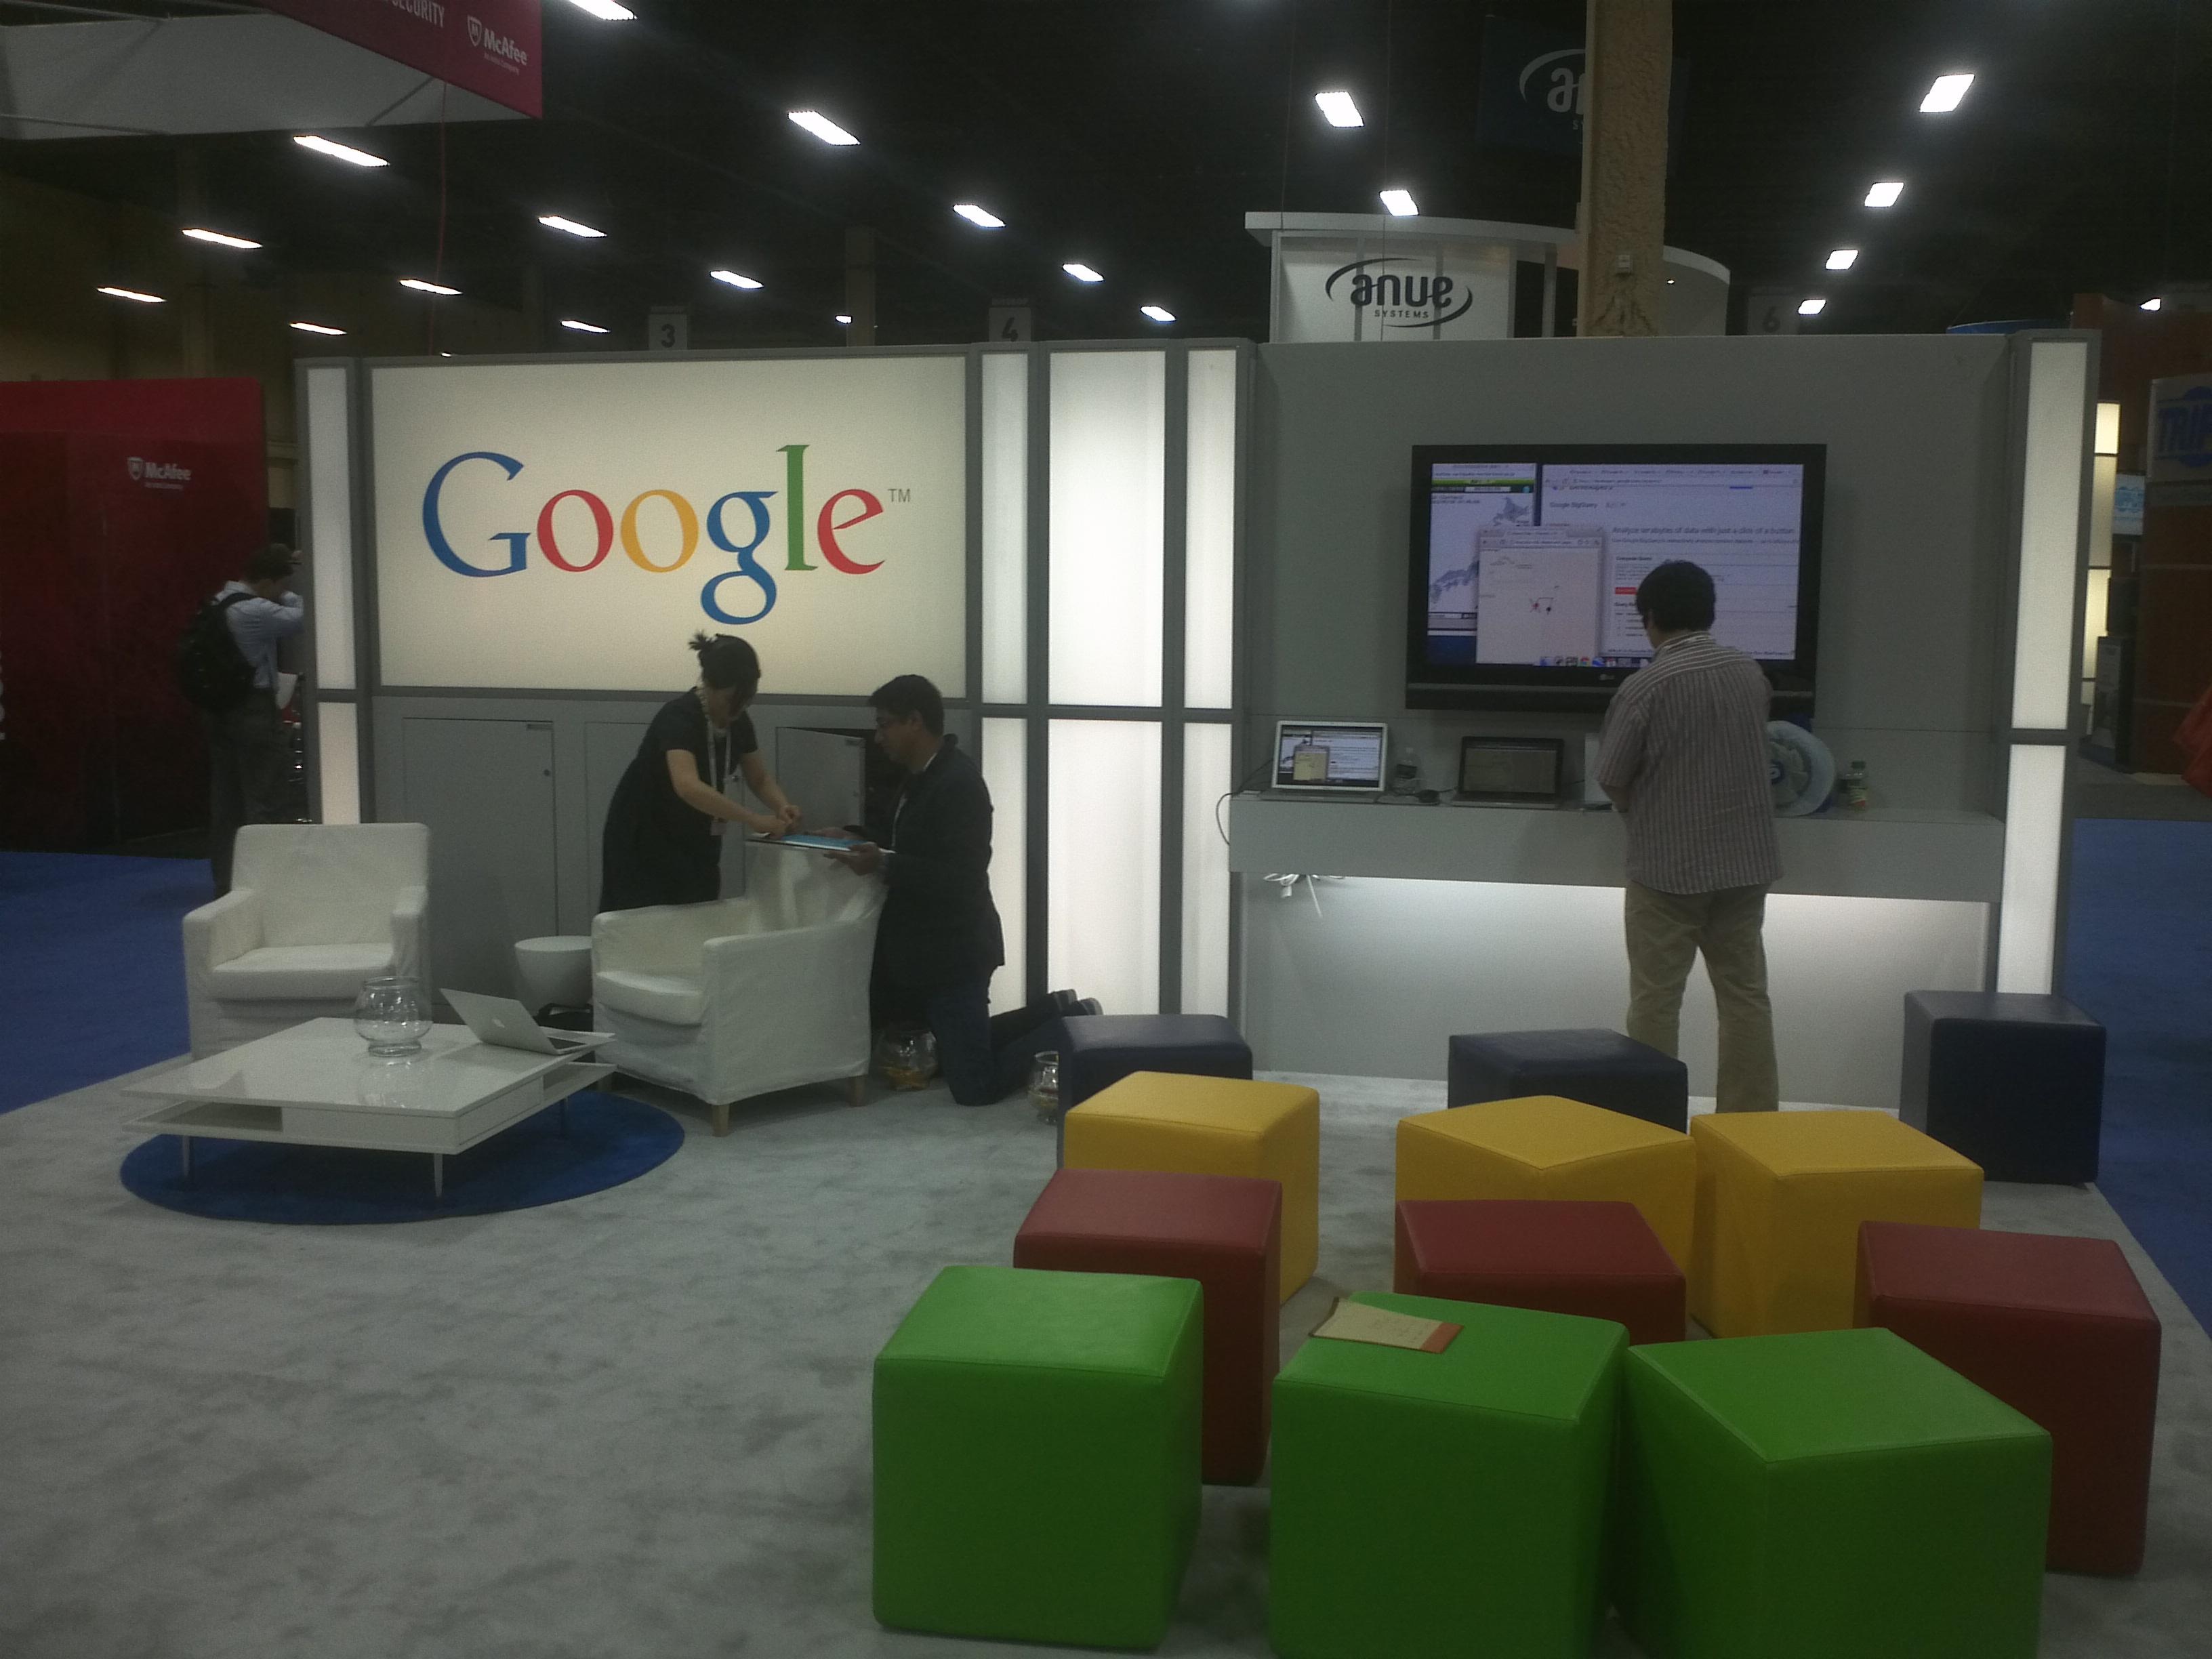 Google's minimalist booth at Interop.